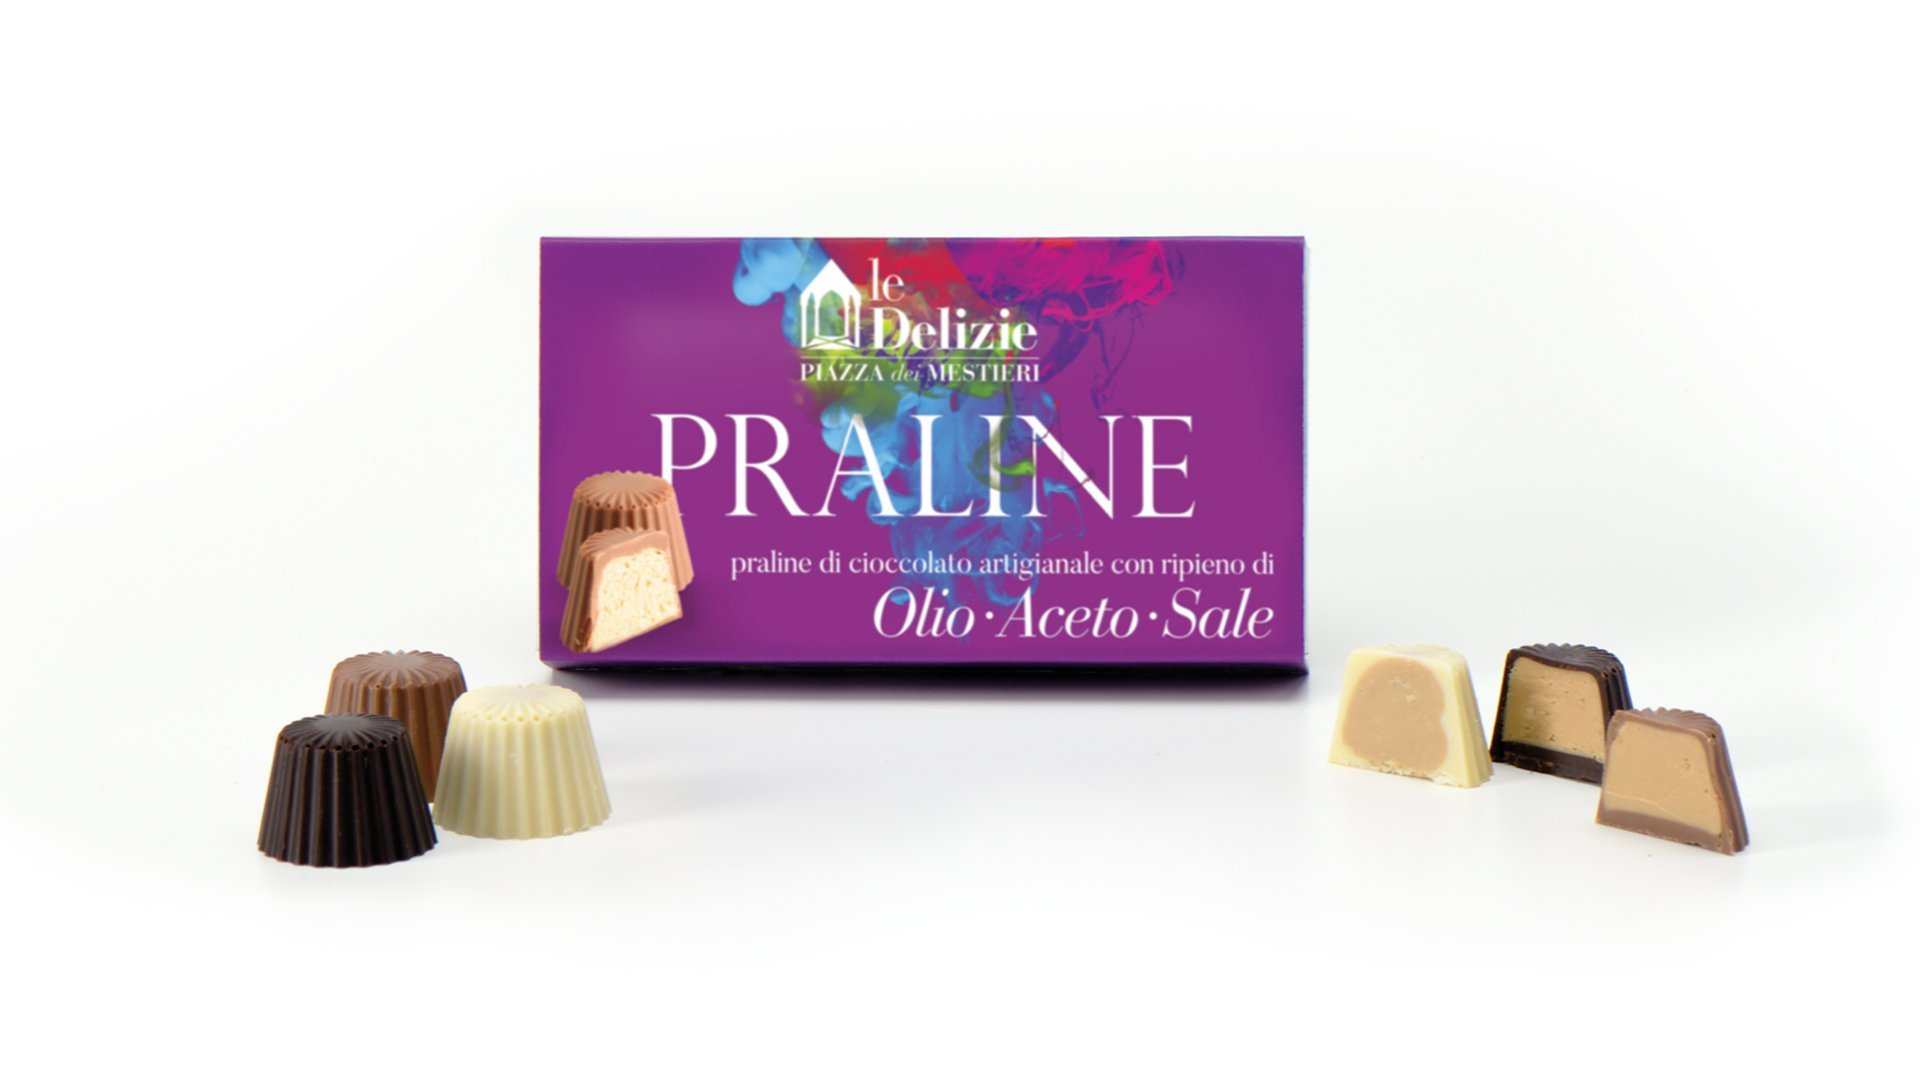 cioccolato cioccolatino praline delizie